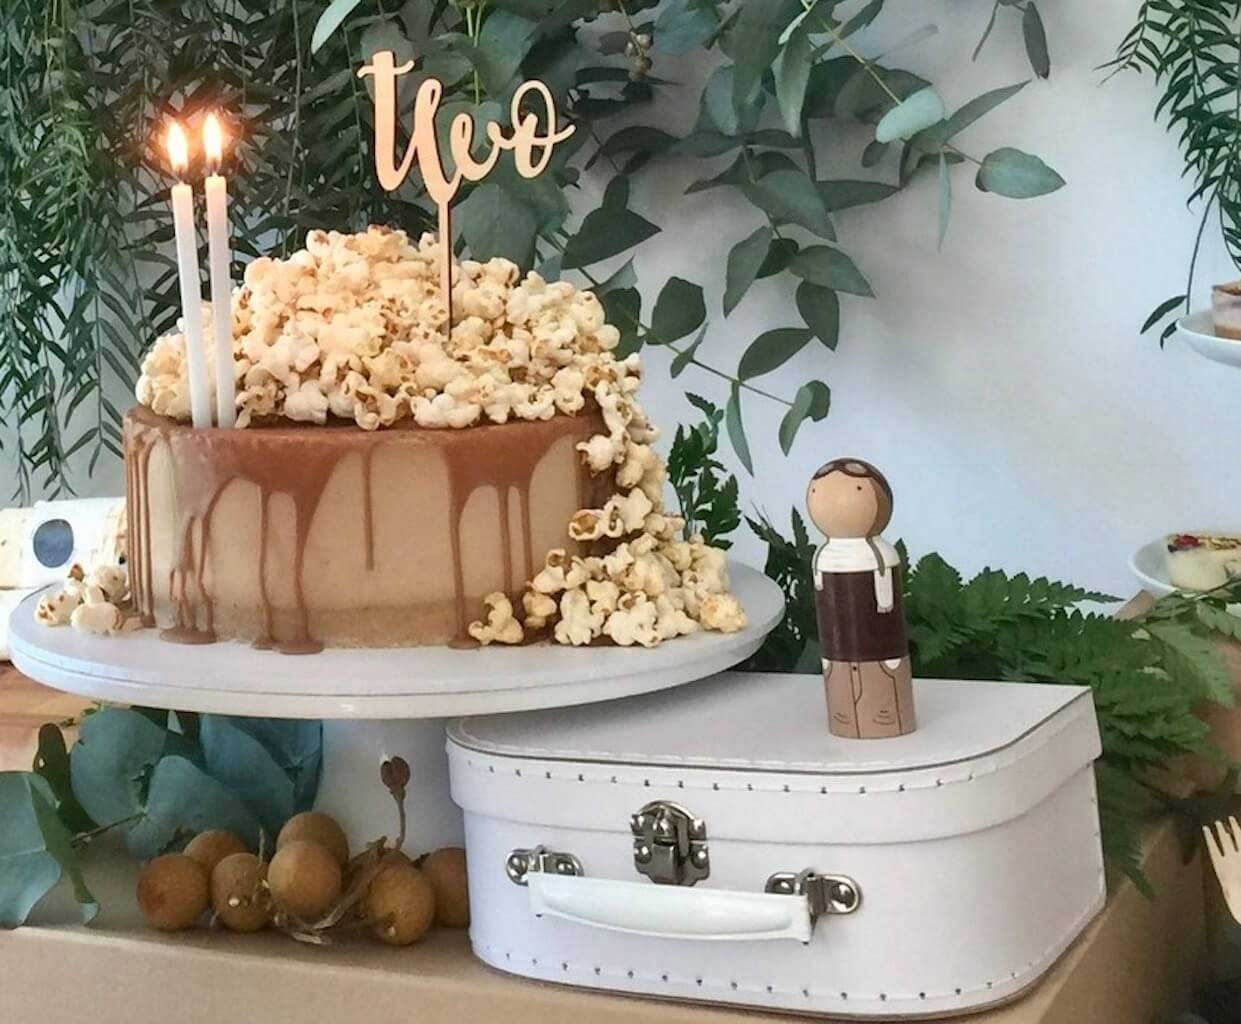 FullSizeRender 005 - Airplane themed birthday party by Honeypunch